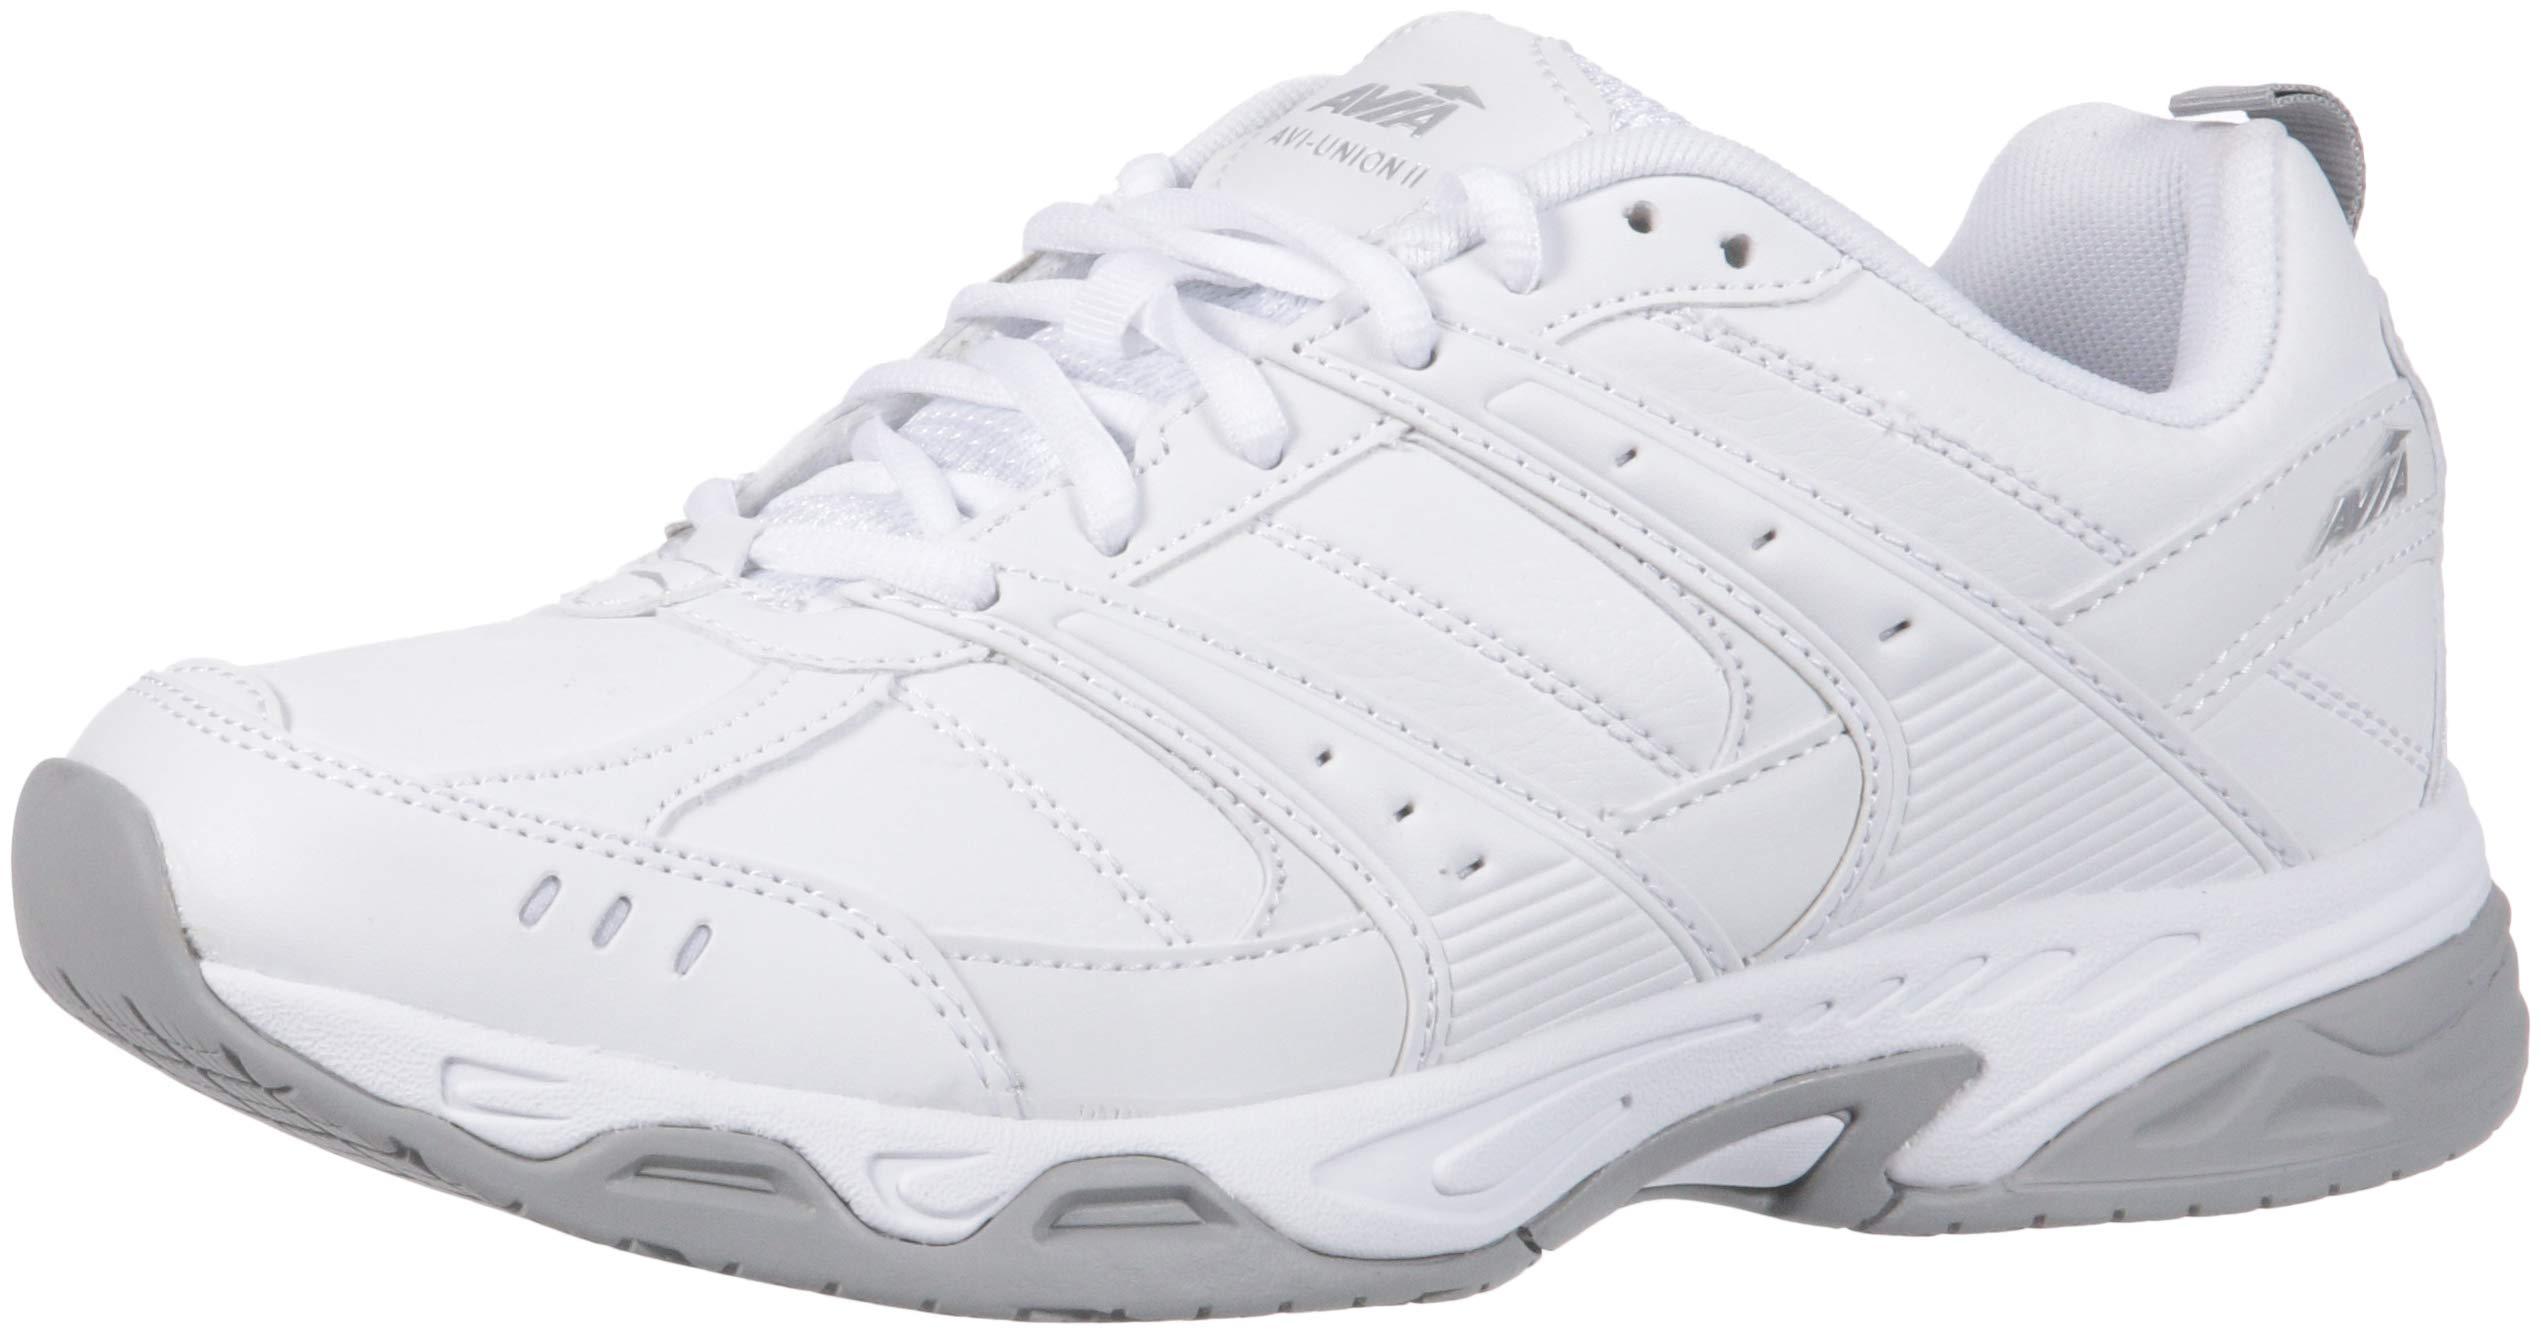 Avia Men's Avi-Union II Food Service Shoe, White/Chrome Silver, 8.5 Medium US